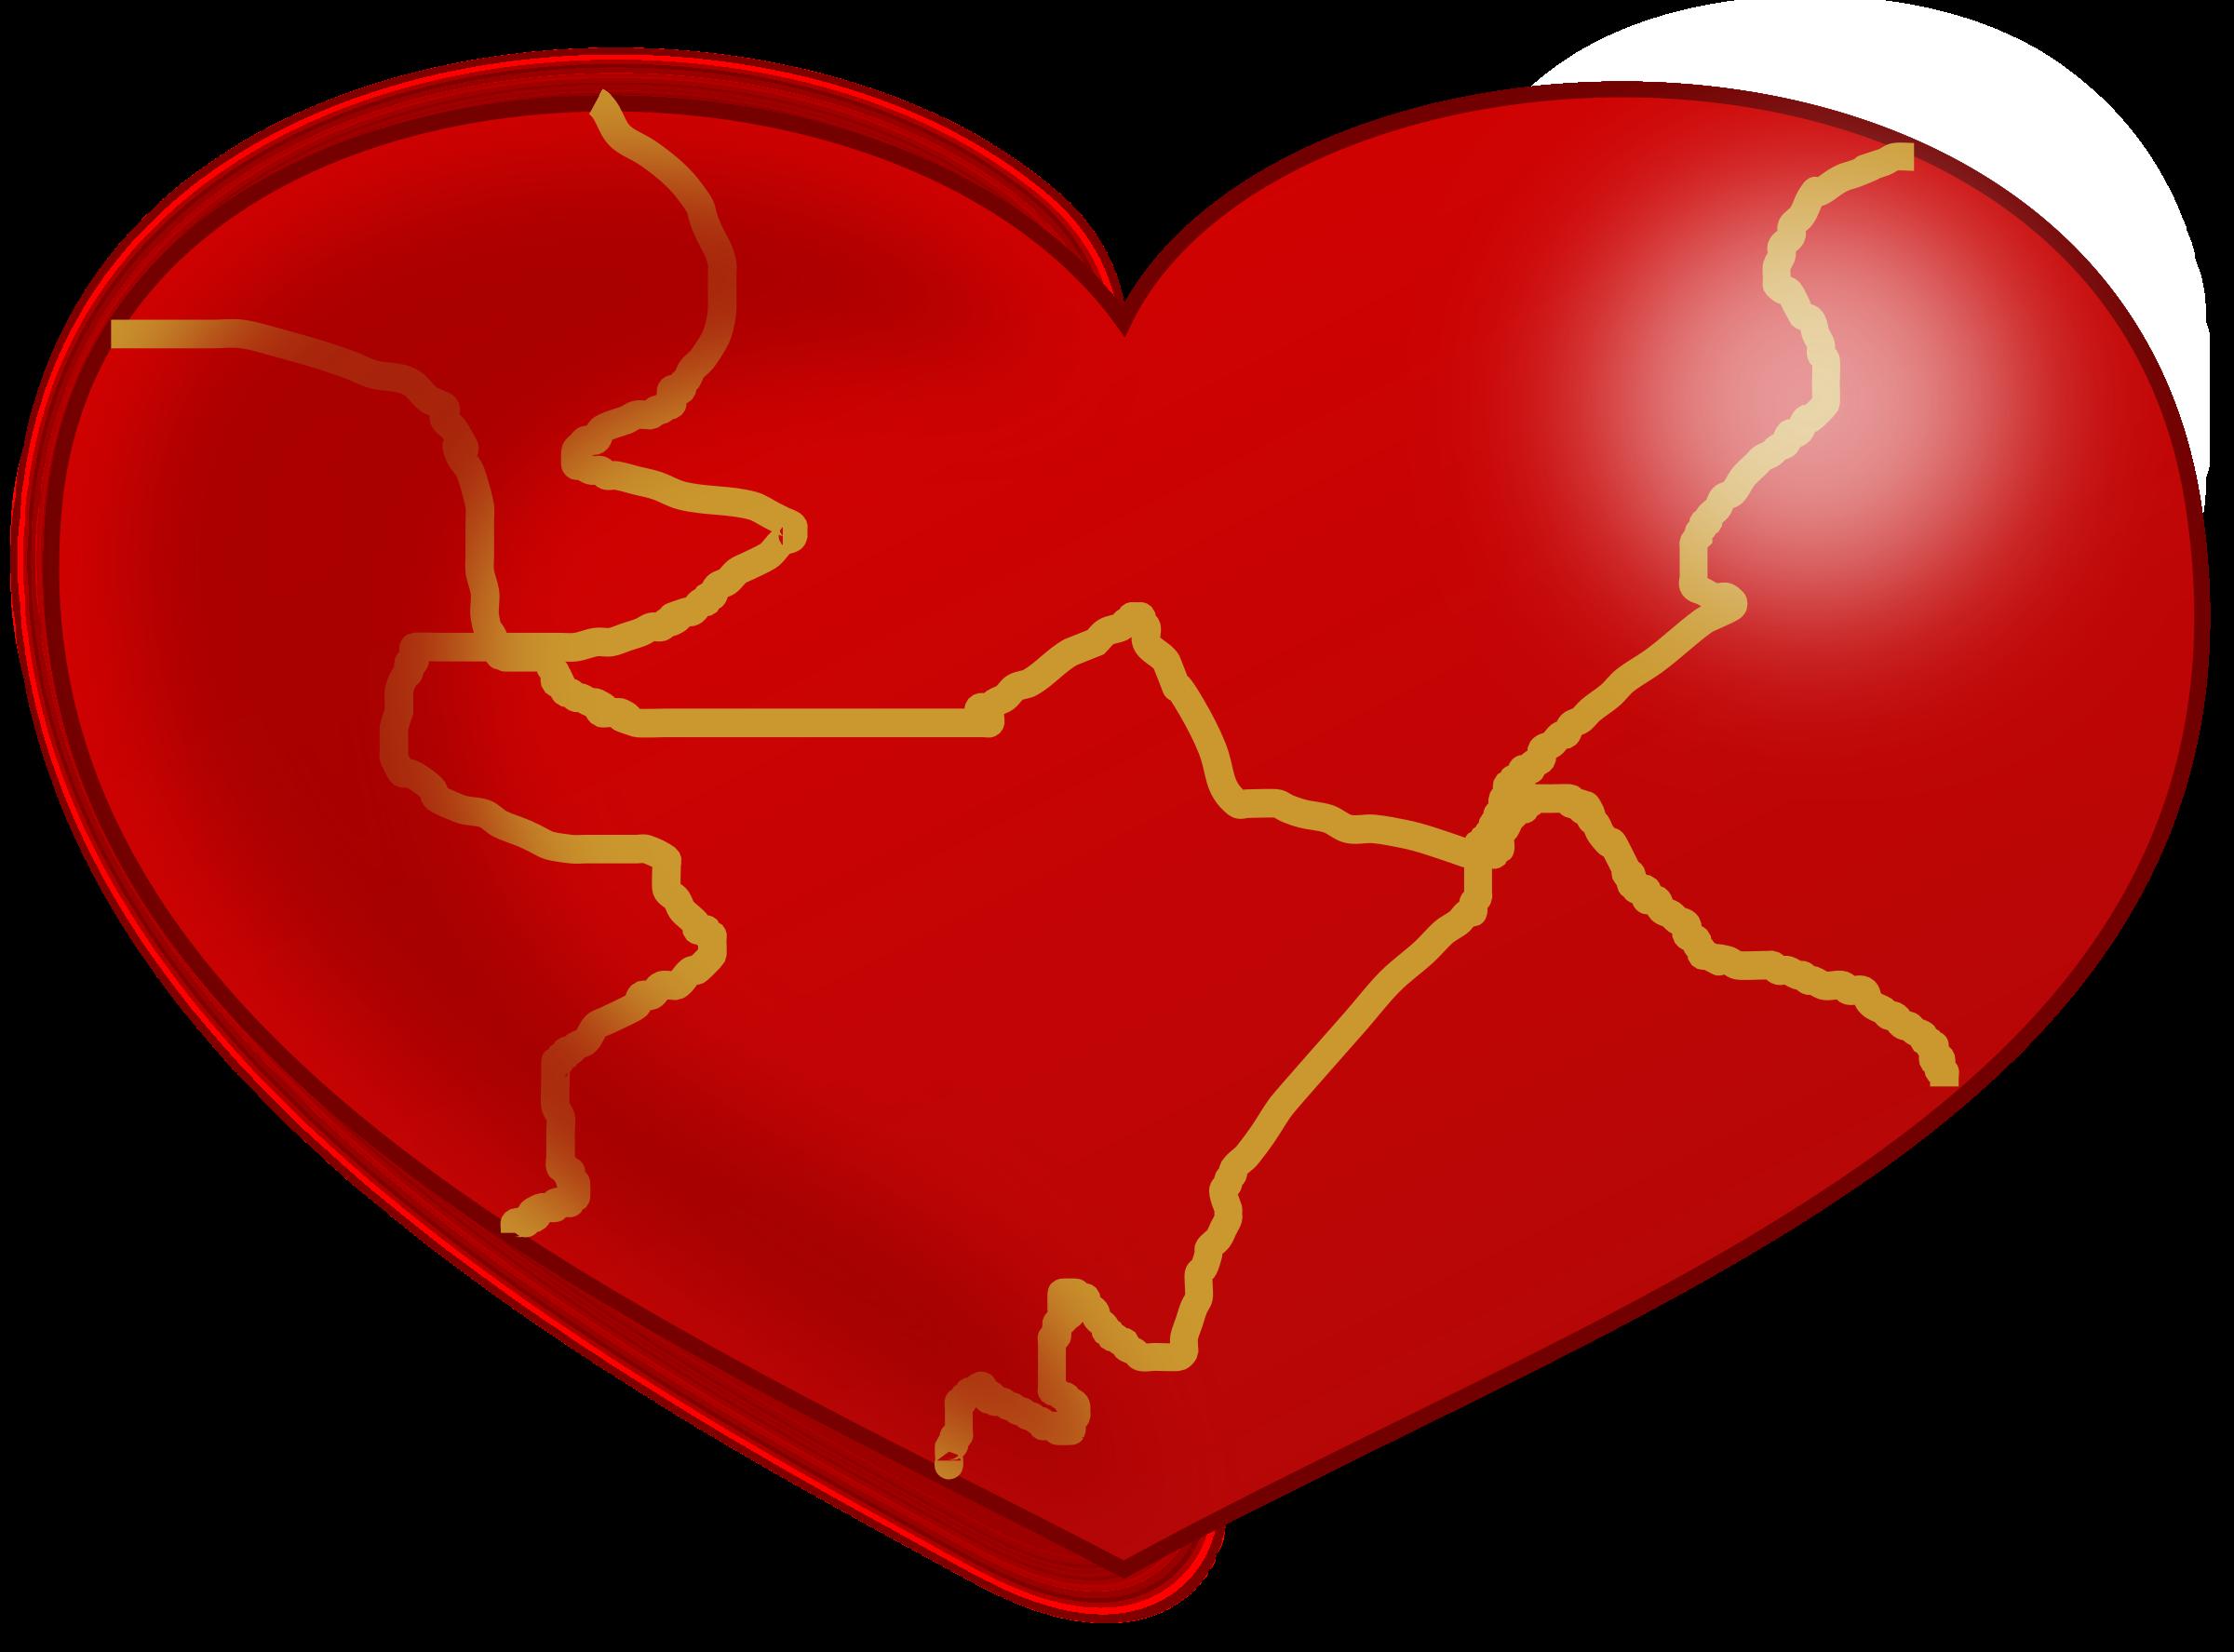 Clipart - Kintsugi Heart jpg royalty free library